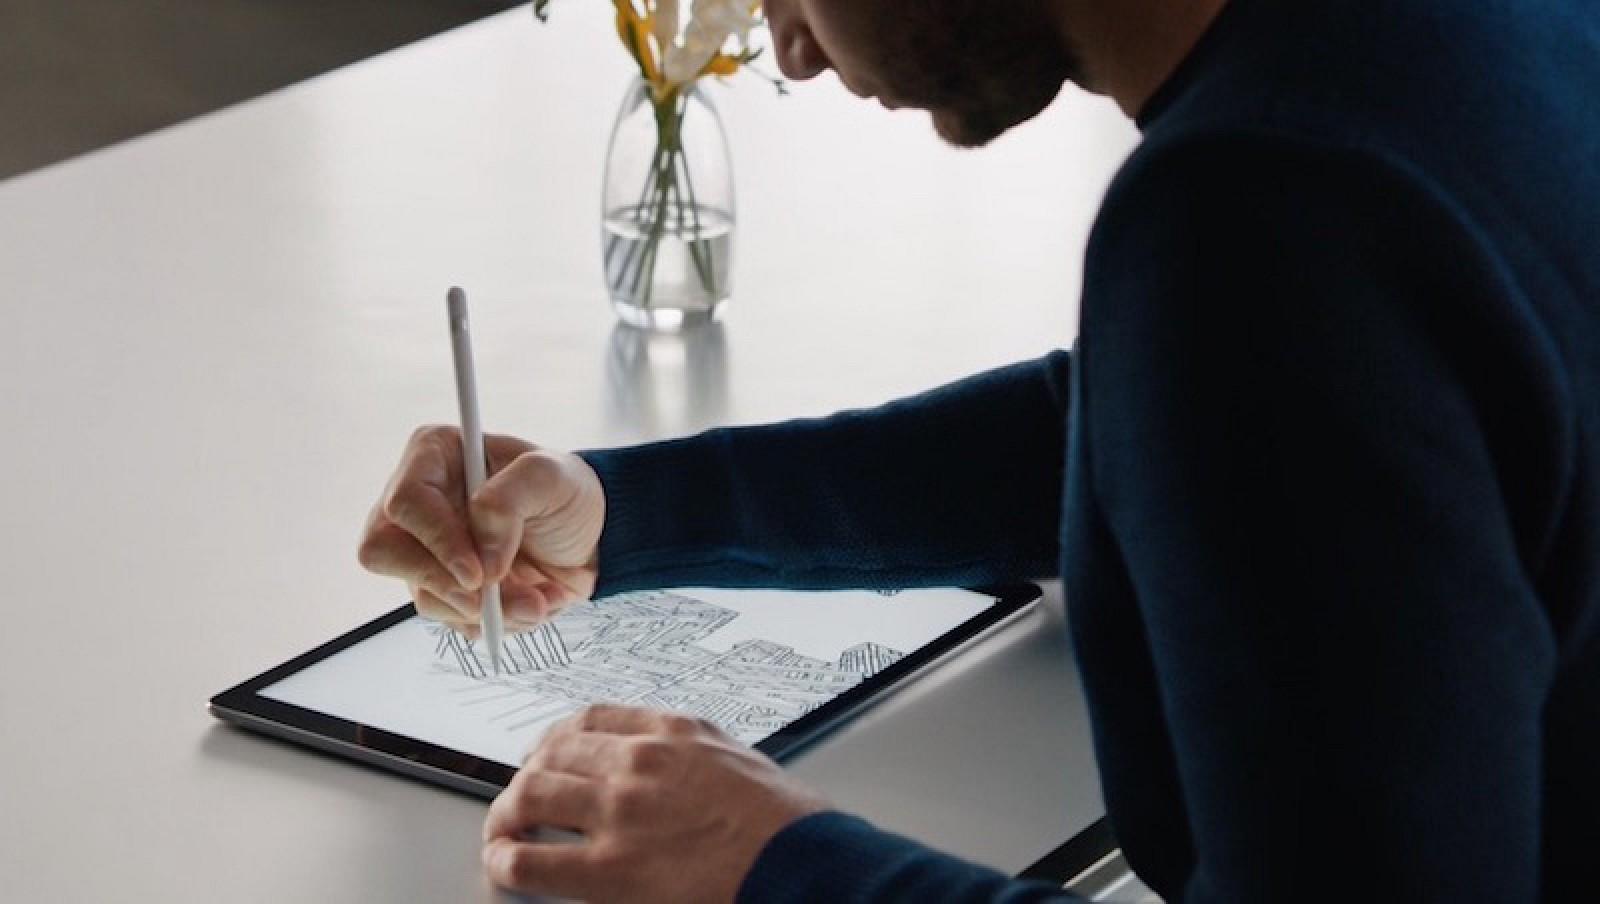 jony ive on apple pencil  a  u0026 39 natural u0026 39  and  u0026 39 familiar